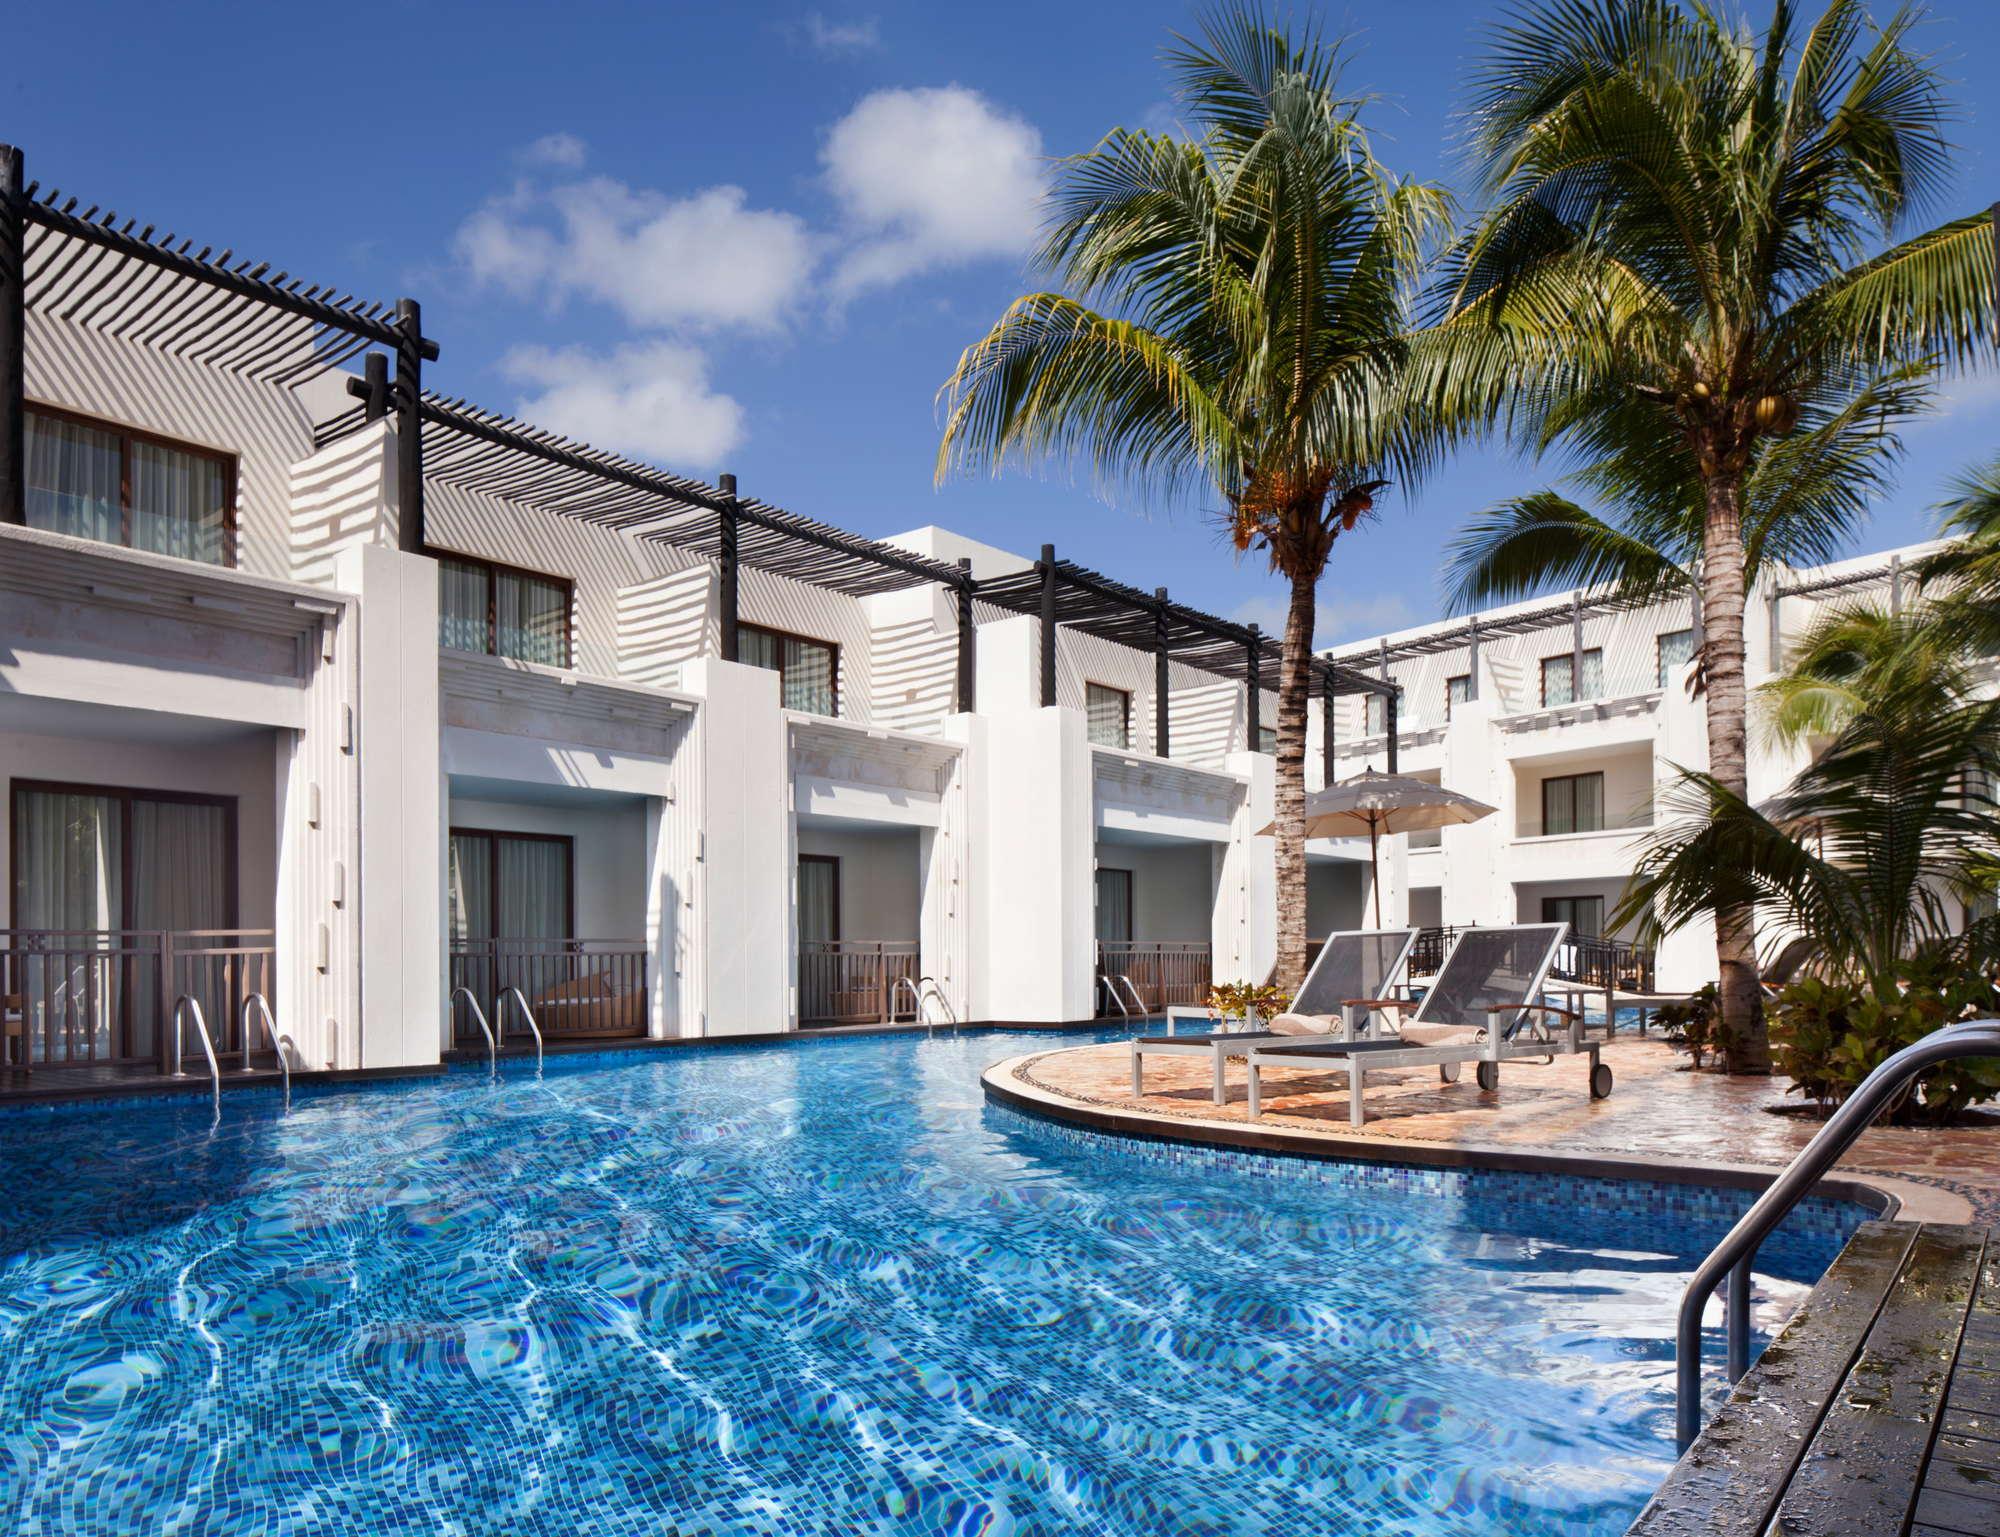 Azul Beach Hotel Expert Review  Fodors Travel